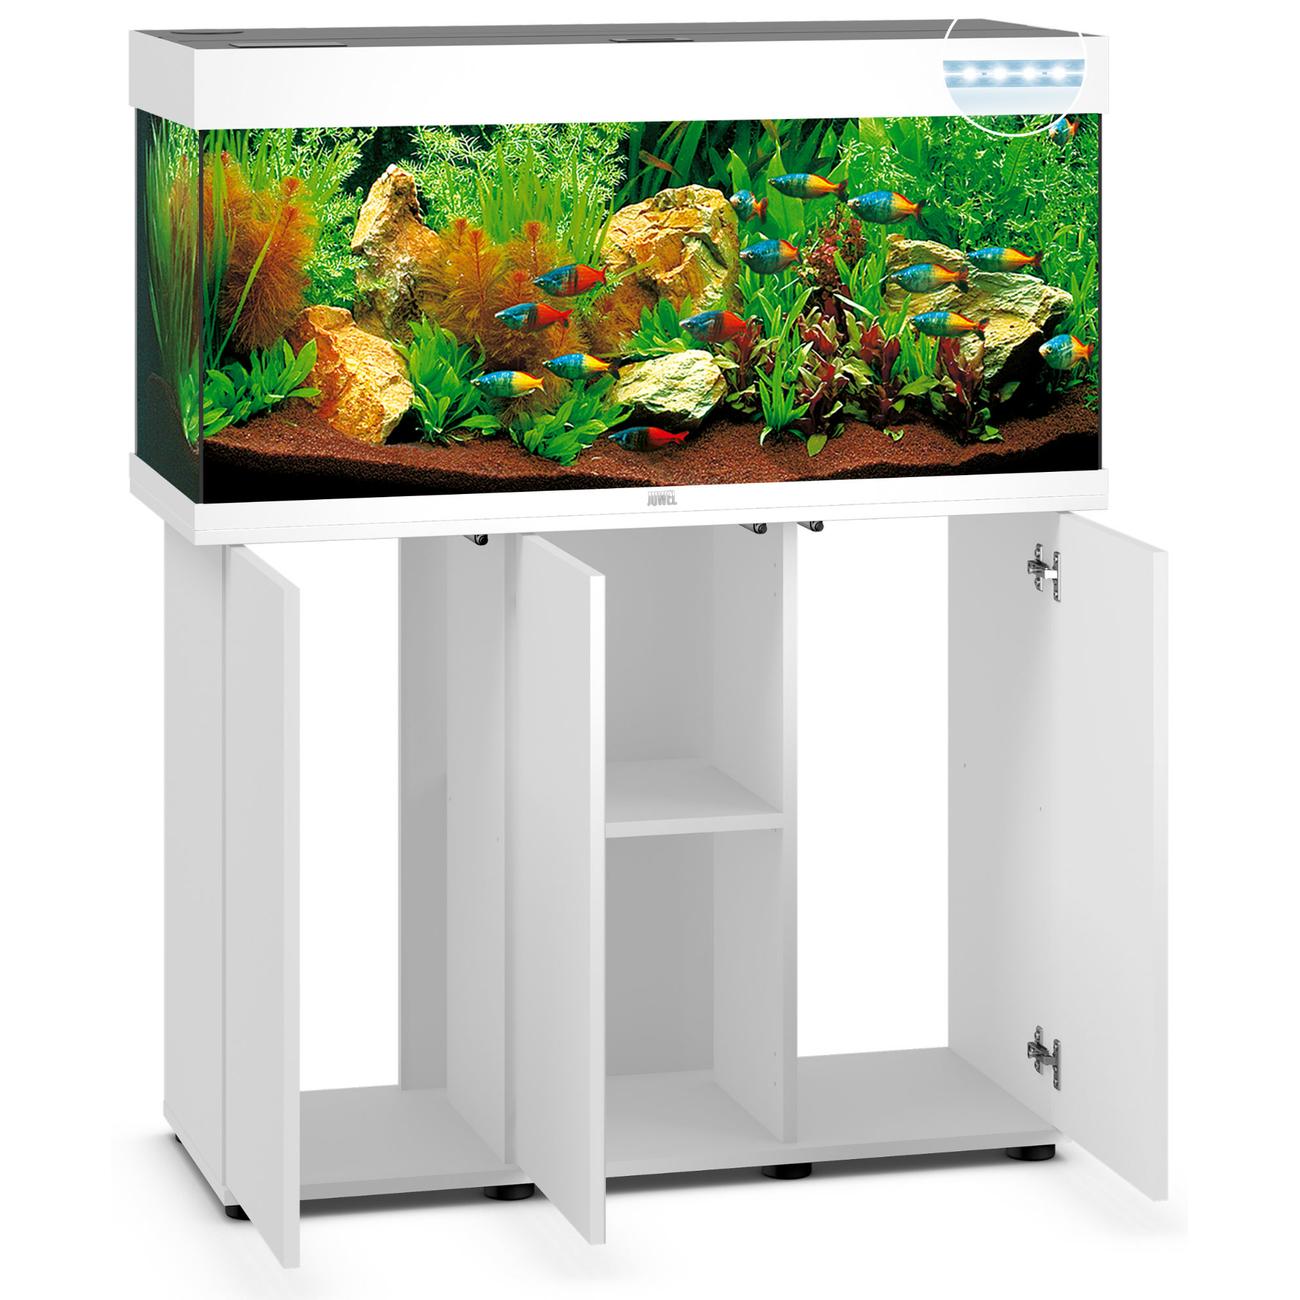 Juwel Rio 180 LED Aquarium mit Unterschrank SBX, Bild 6